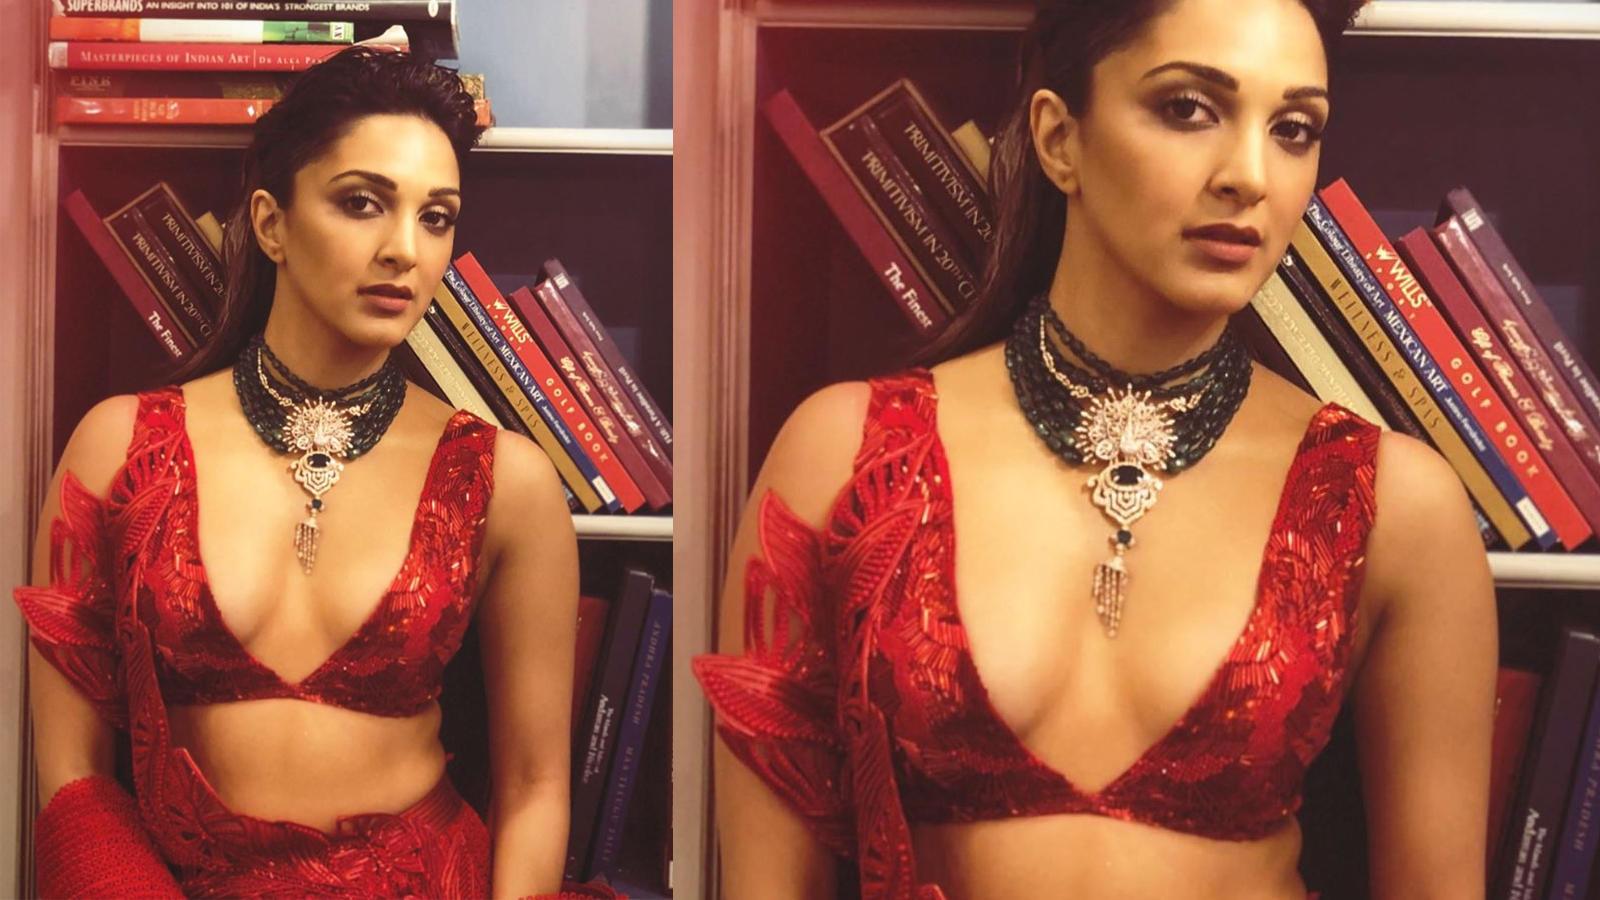 Kiara Advani looks gorgeous in red plunging neckline dress as she walks the ramp